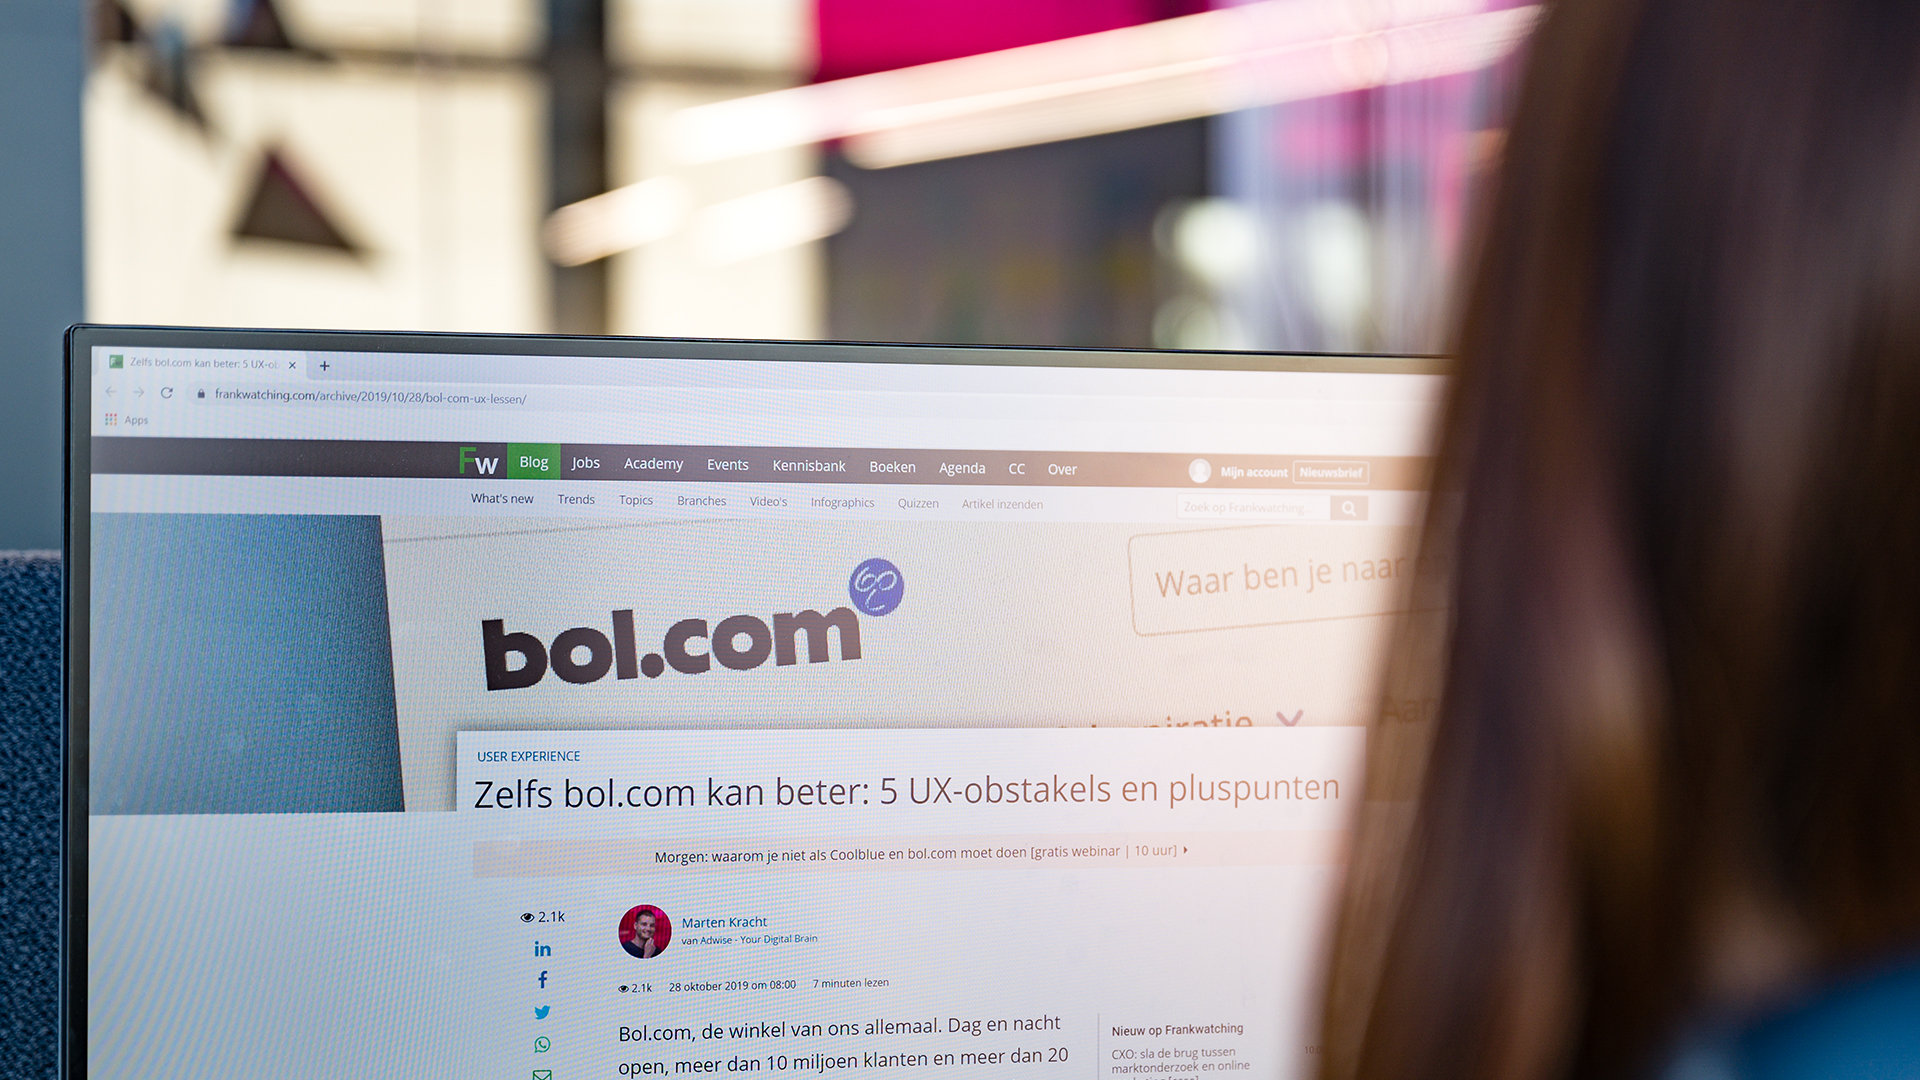 Zelfs bol.com kan beter: 5 UX-obstakels en pluspunten op Frankwatching